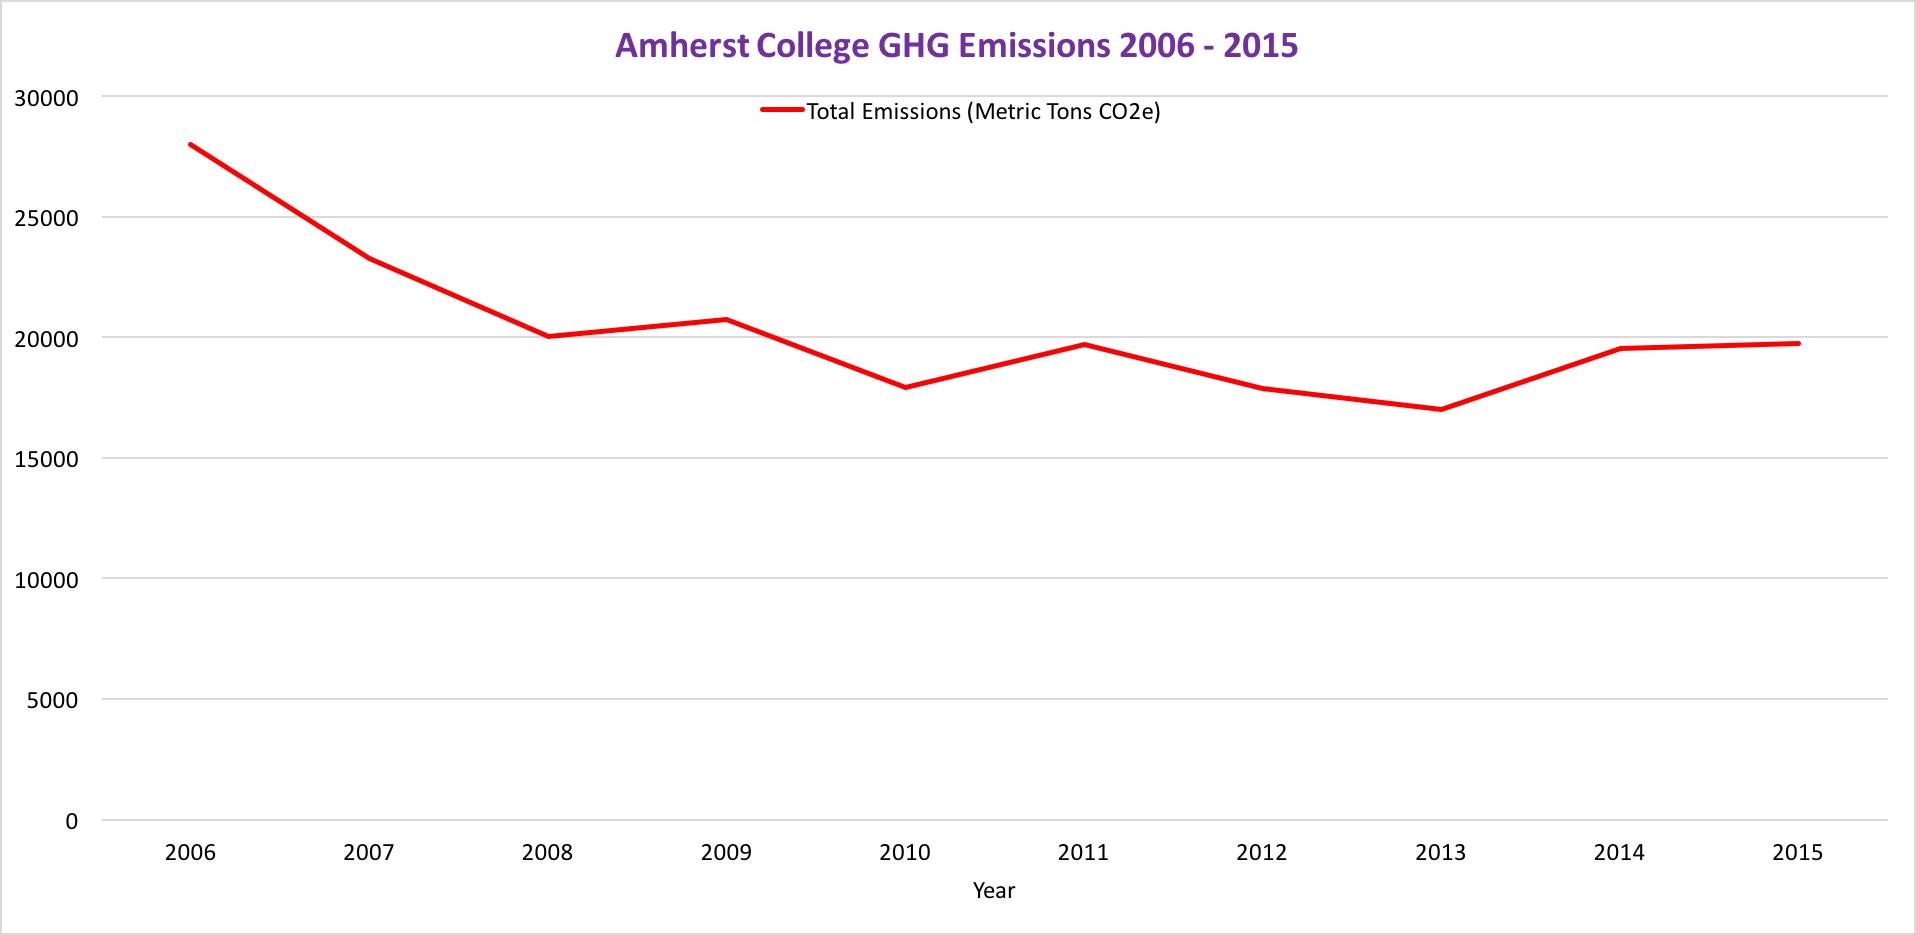 Amherst College GHG Emissions 2006-2015